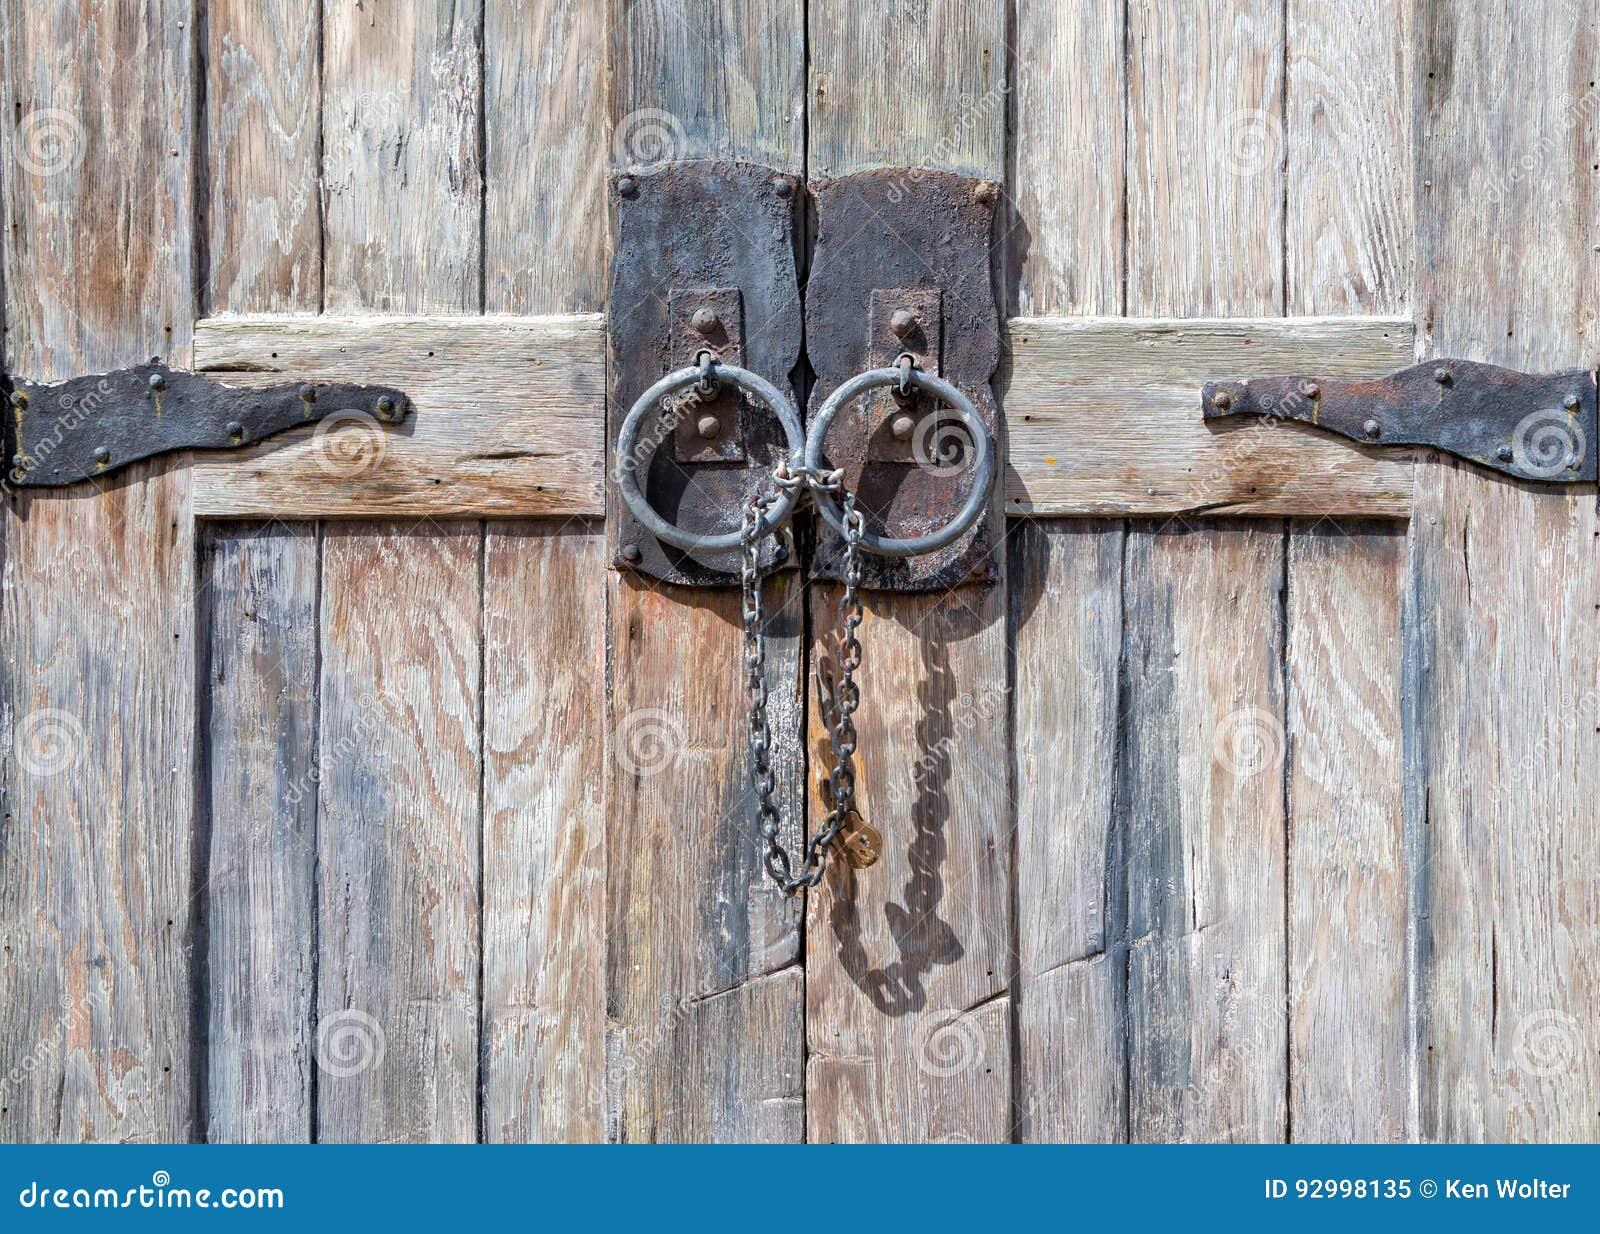 Verschlossene tür  Strukturierte Antiken-verschlossene Tür Stock Abbildung - Bild ...